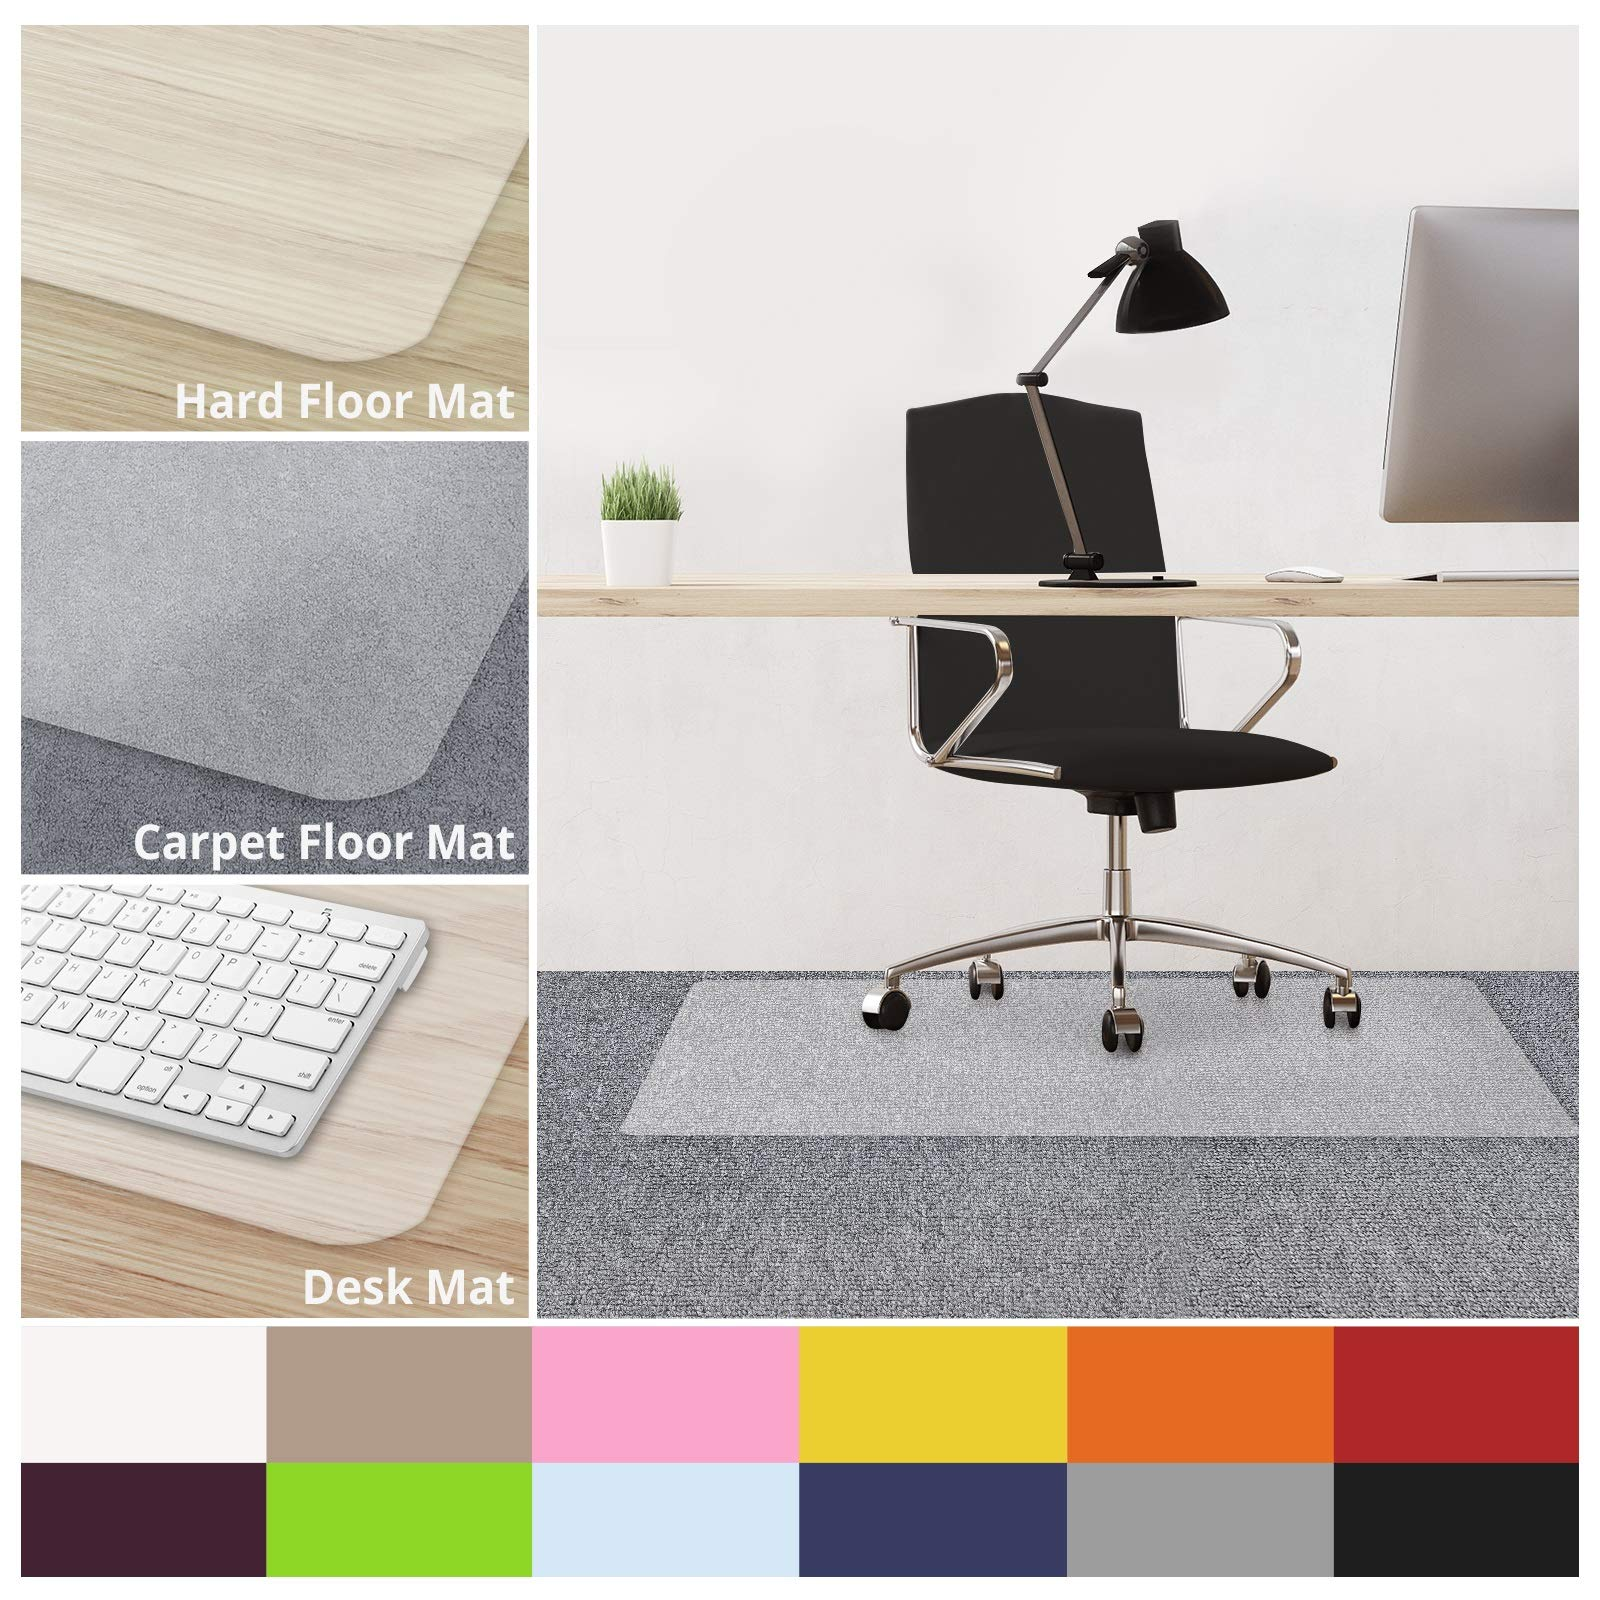 casa pura Office Chair Mats for Carpeted Floors - 30''x48'' | Carpet Protector Floor Mat, Transparent - BPA Free, Odorless